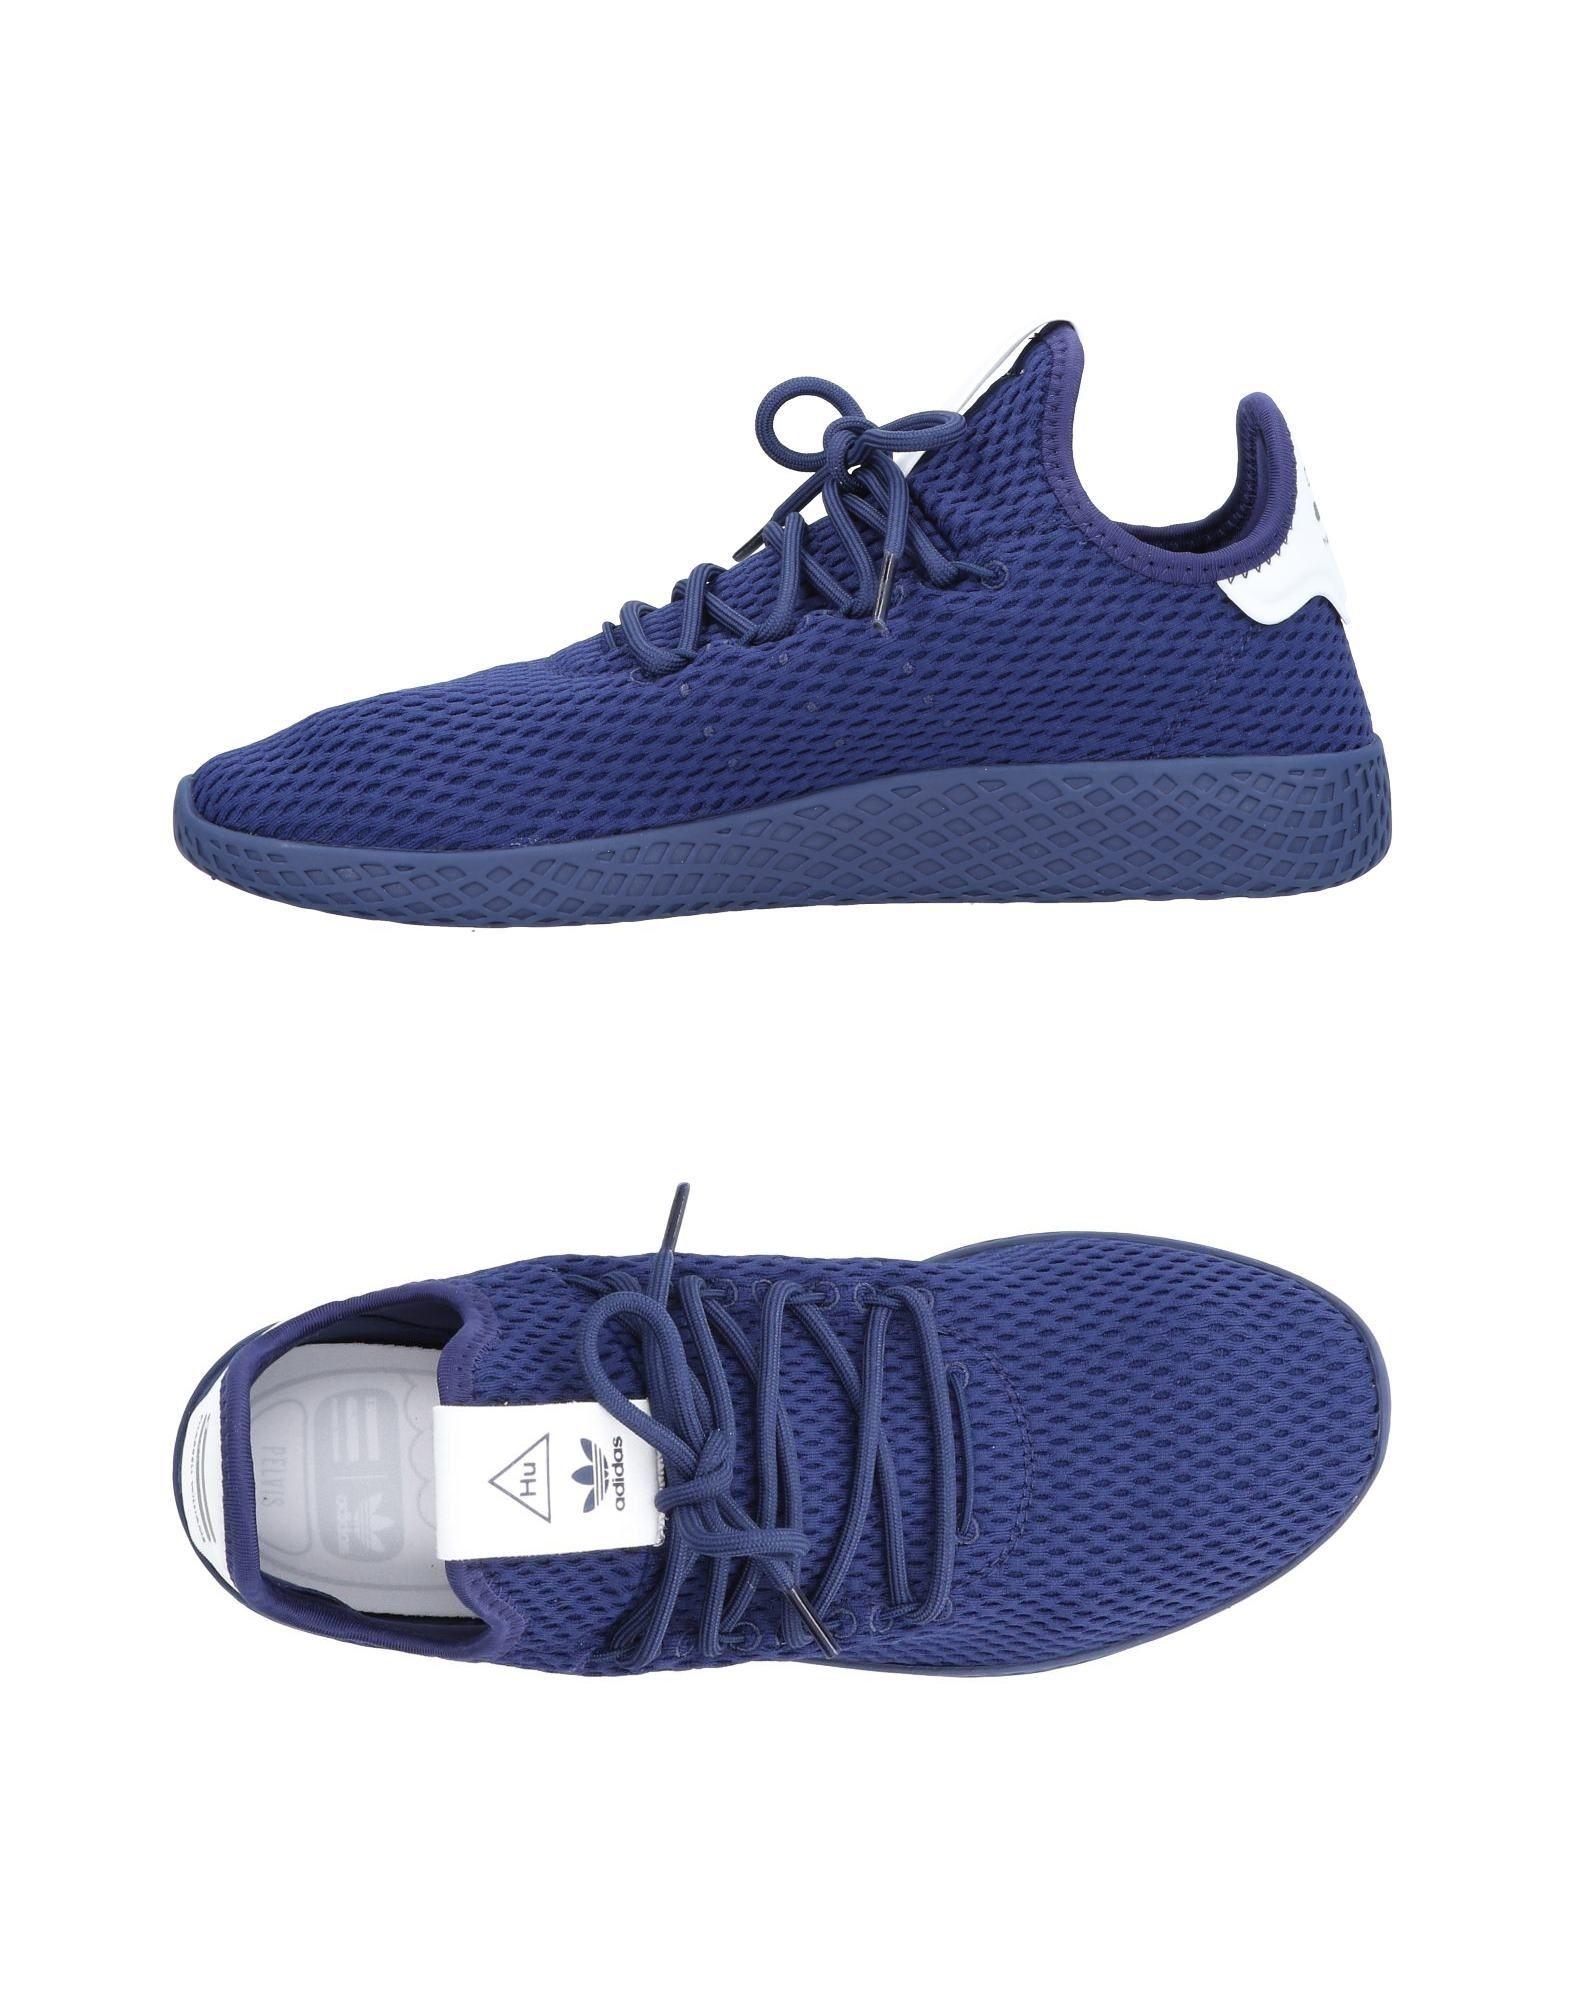 ADIDAS PHARRELL WILLIAMS Низкие кеды и кроссовки adidas x pharrell little kids superstar supercolor